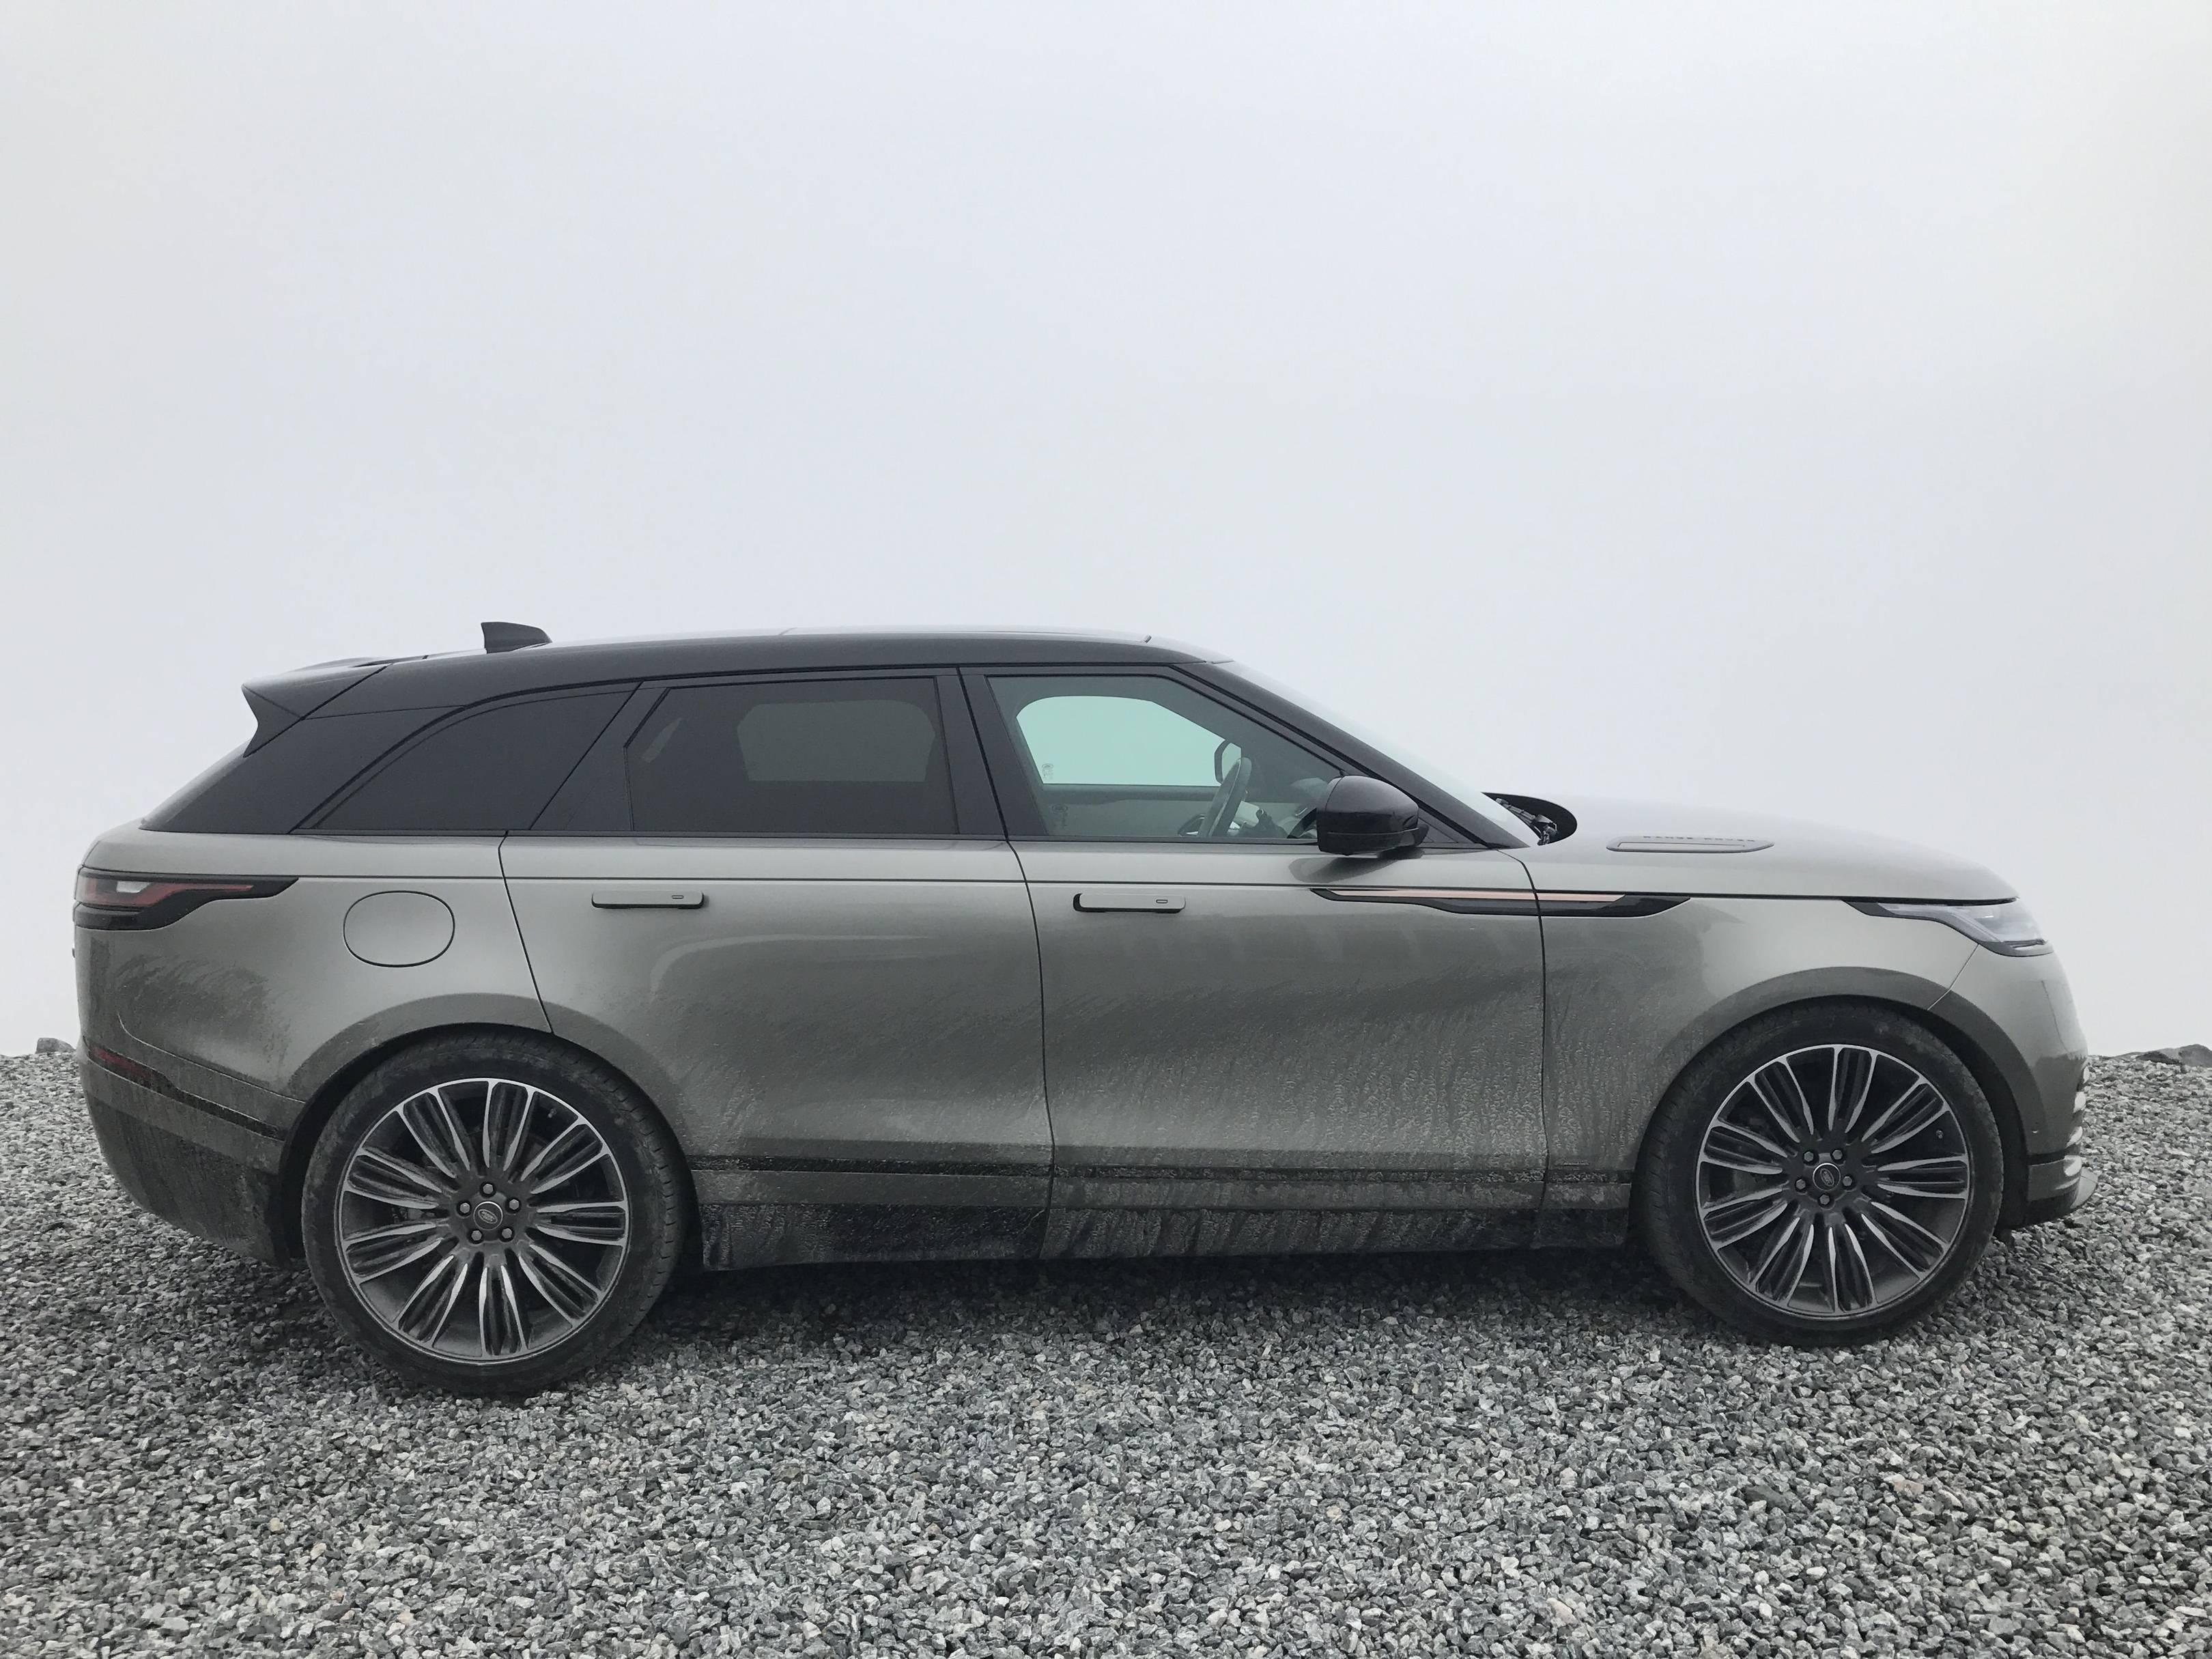 New Range Rover Velar review: A huge success, despite some niggles